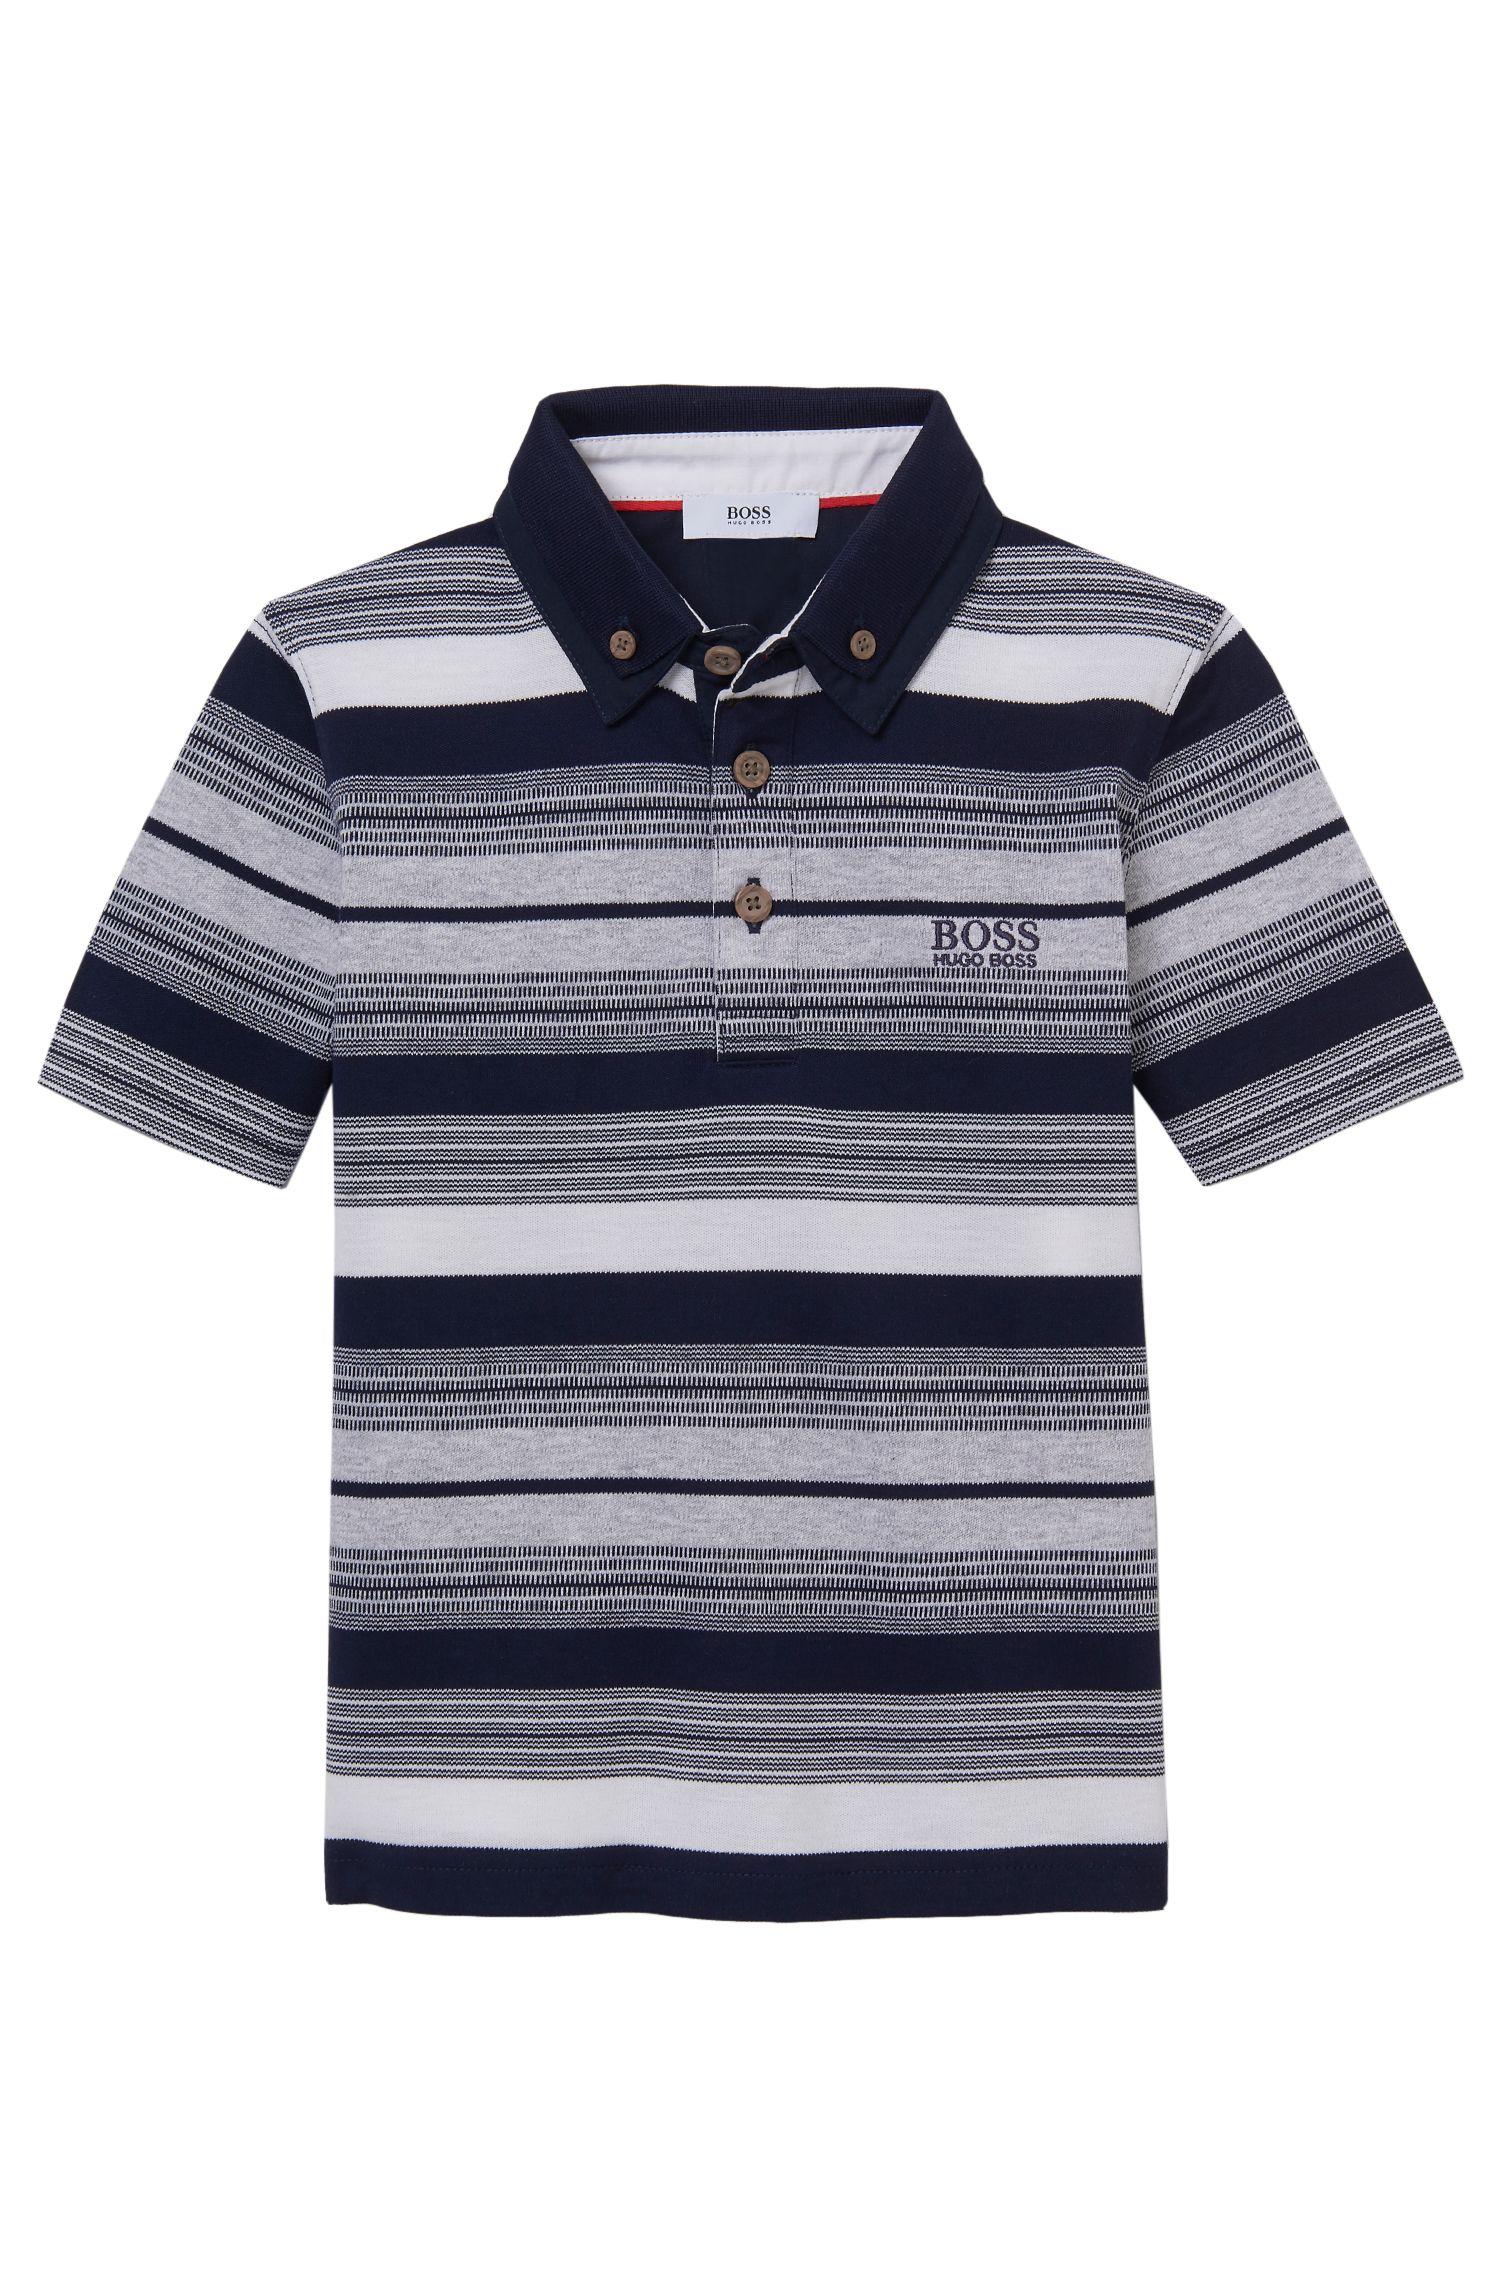 'J25913' | Boys Stretch Cotton Striped Polo Shirt